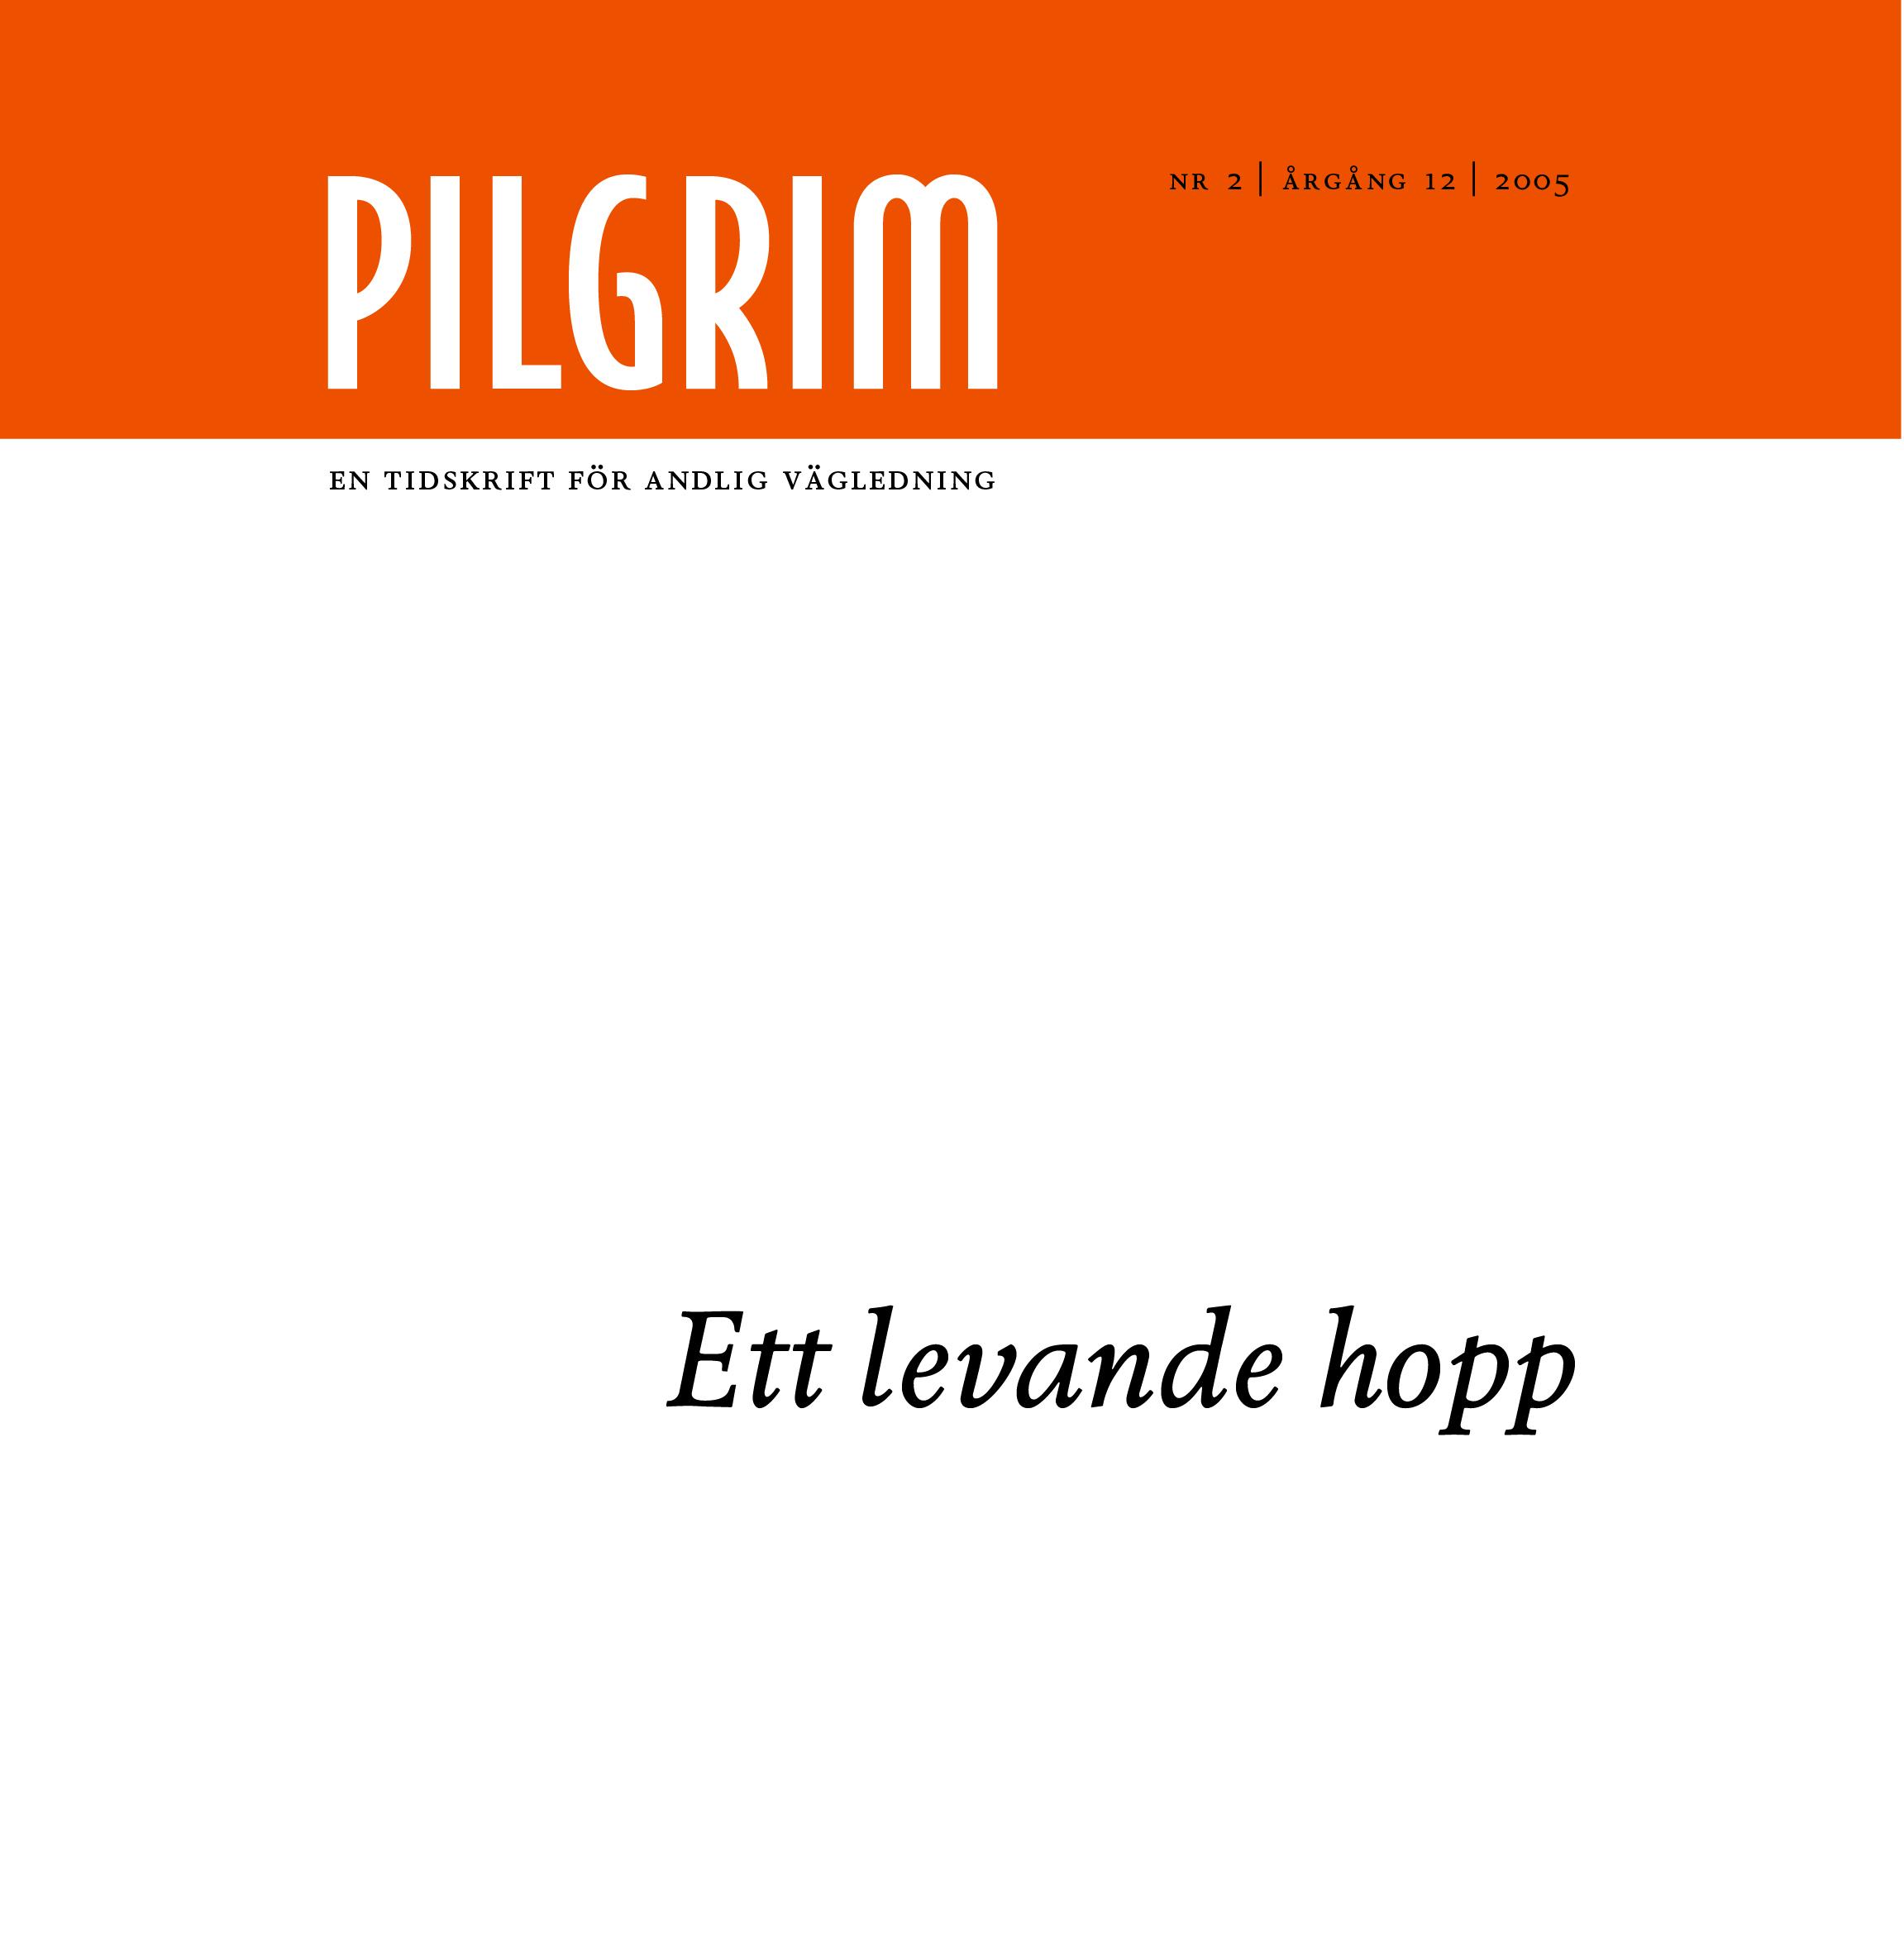 Pilgrim frams 2005-2